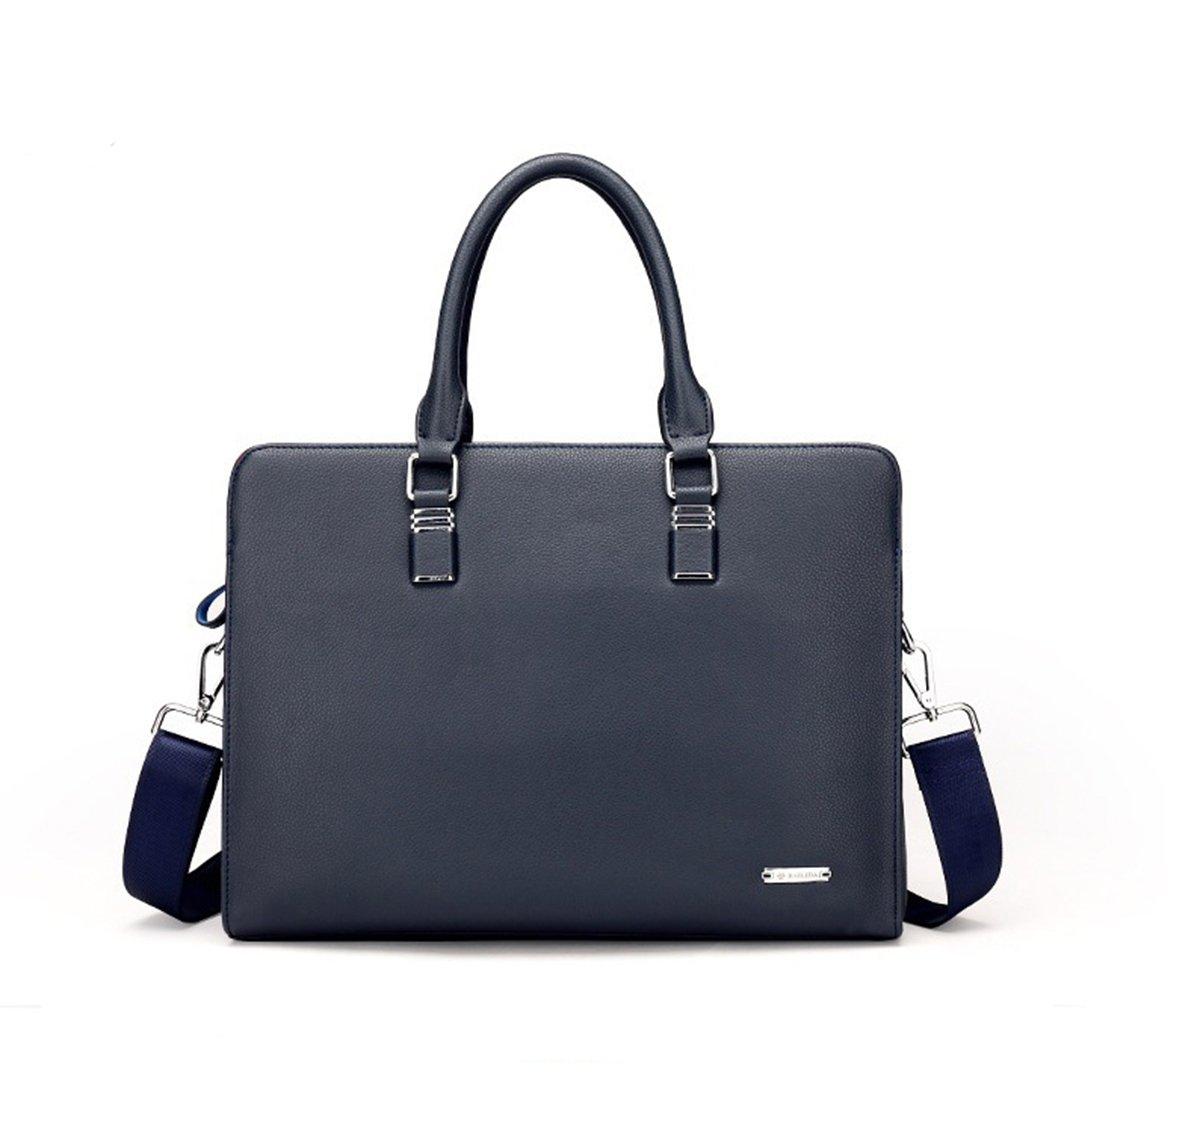 AIAIMEI Men's Large Shoulder Genuine Leather Laptop Briefcase Business Office Messenger Bags Handbags Laptop Bags Leather Crossbody Bags Blue